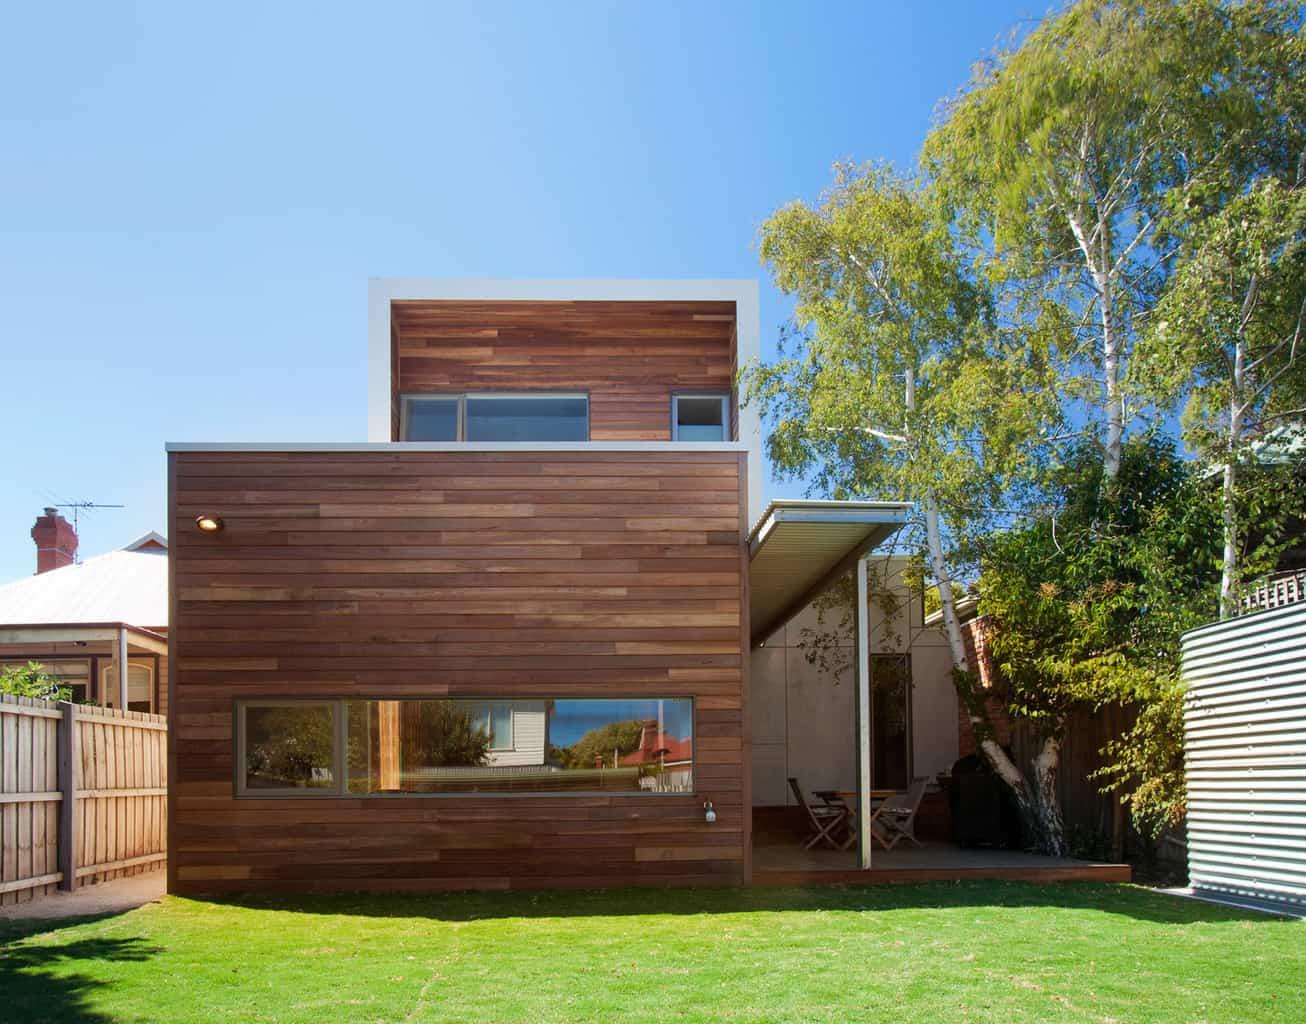 2012 Houses Awards: Jack and Jill house